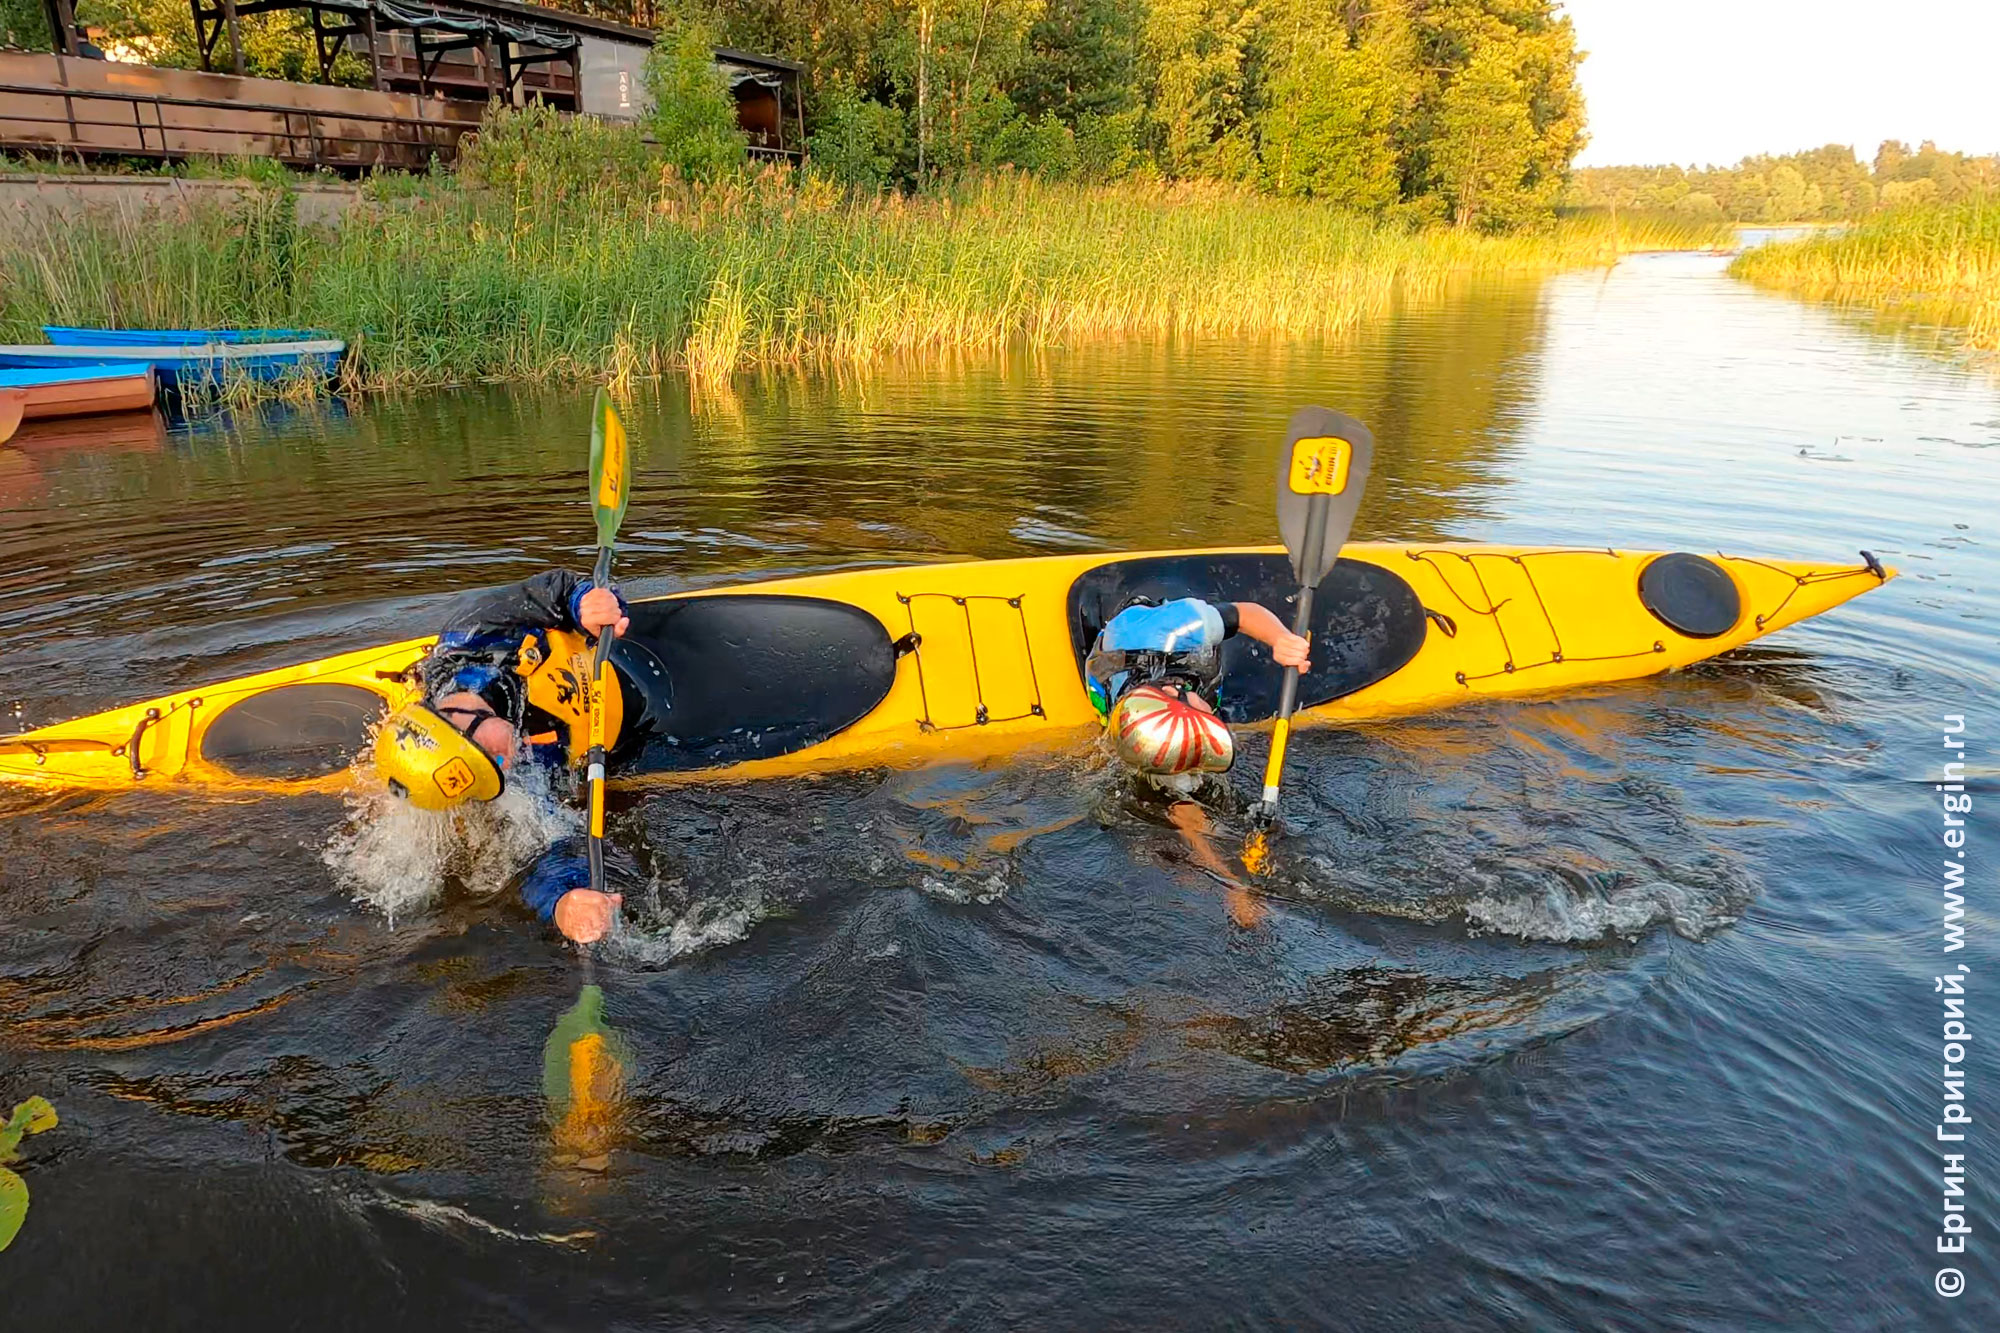 Эскимосский переворот на байдарке Байдарка Tahe Marine Lifestyle Duo